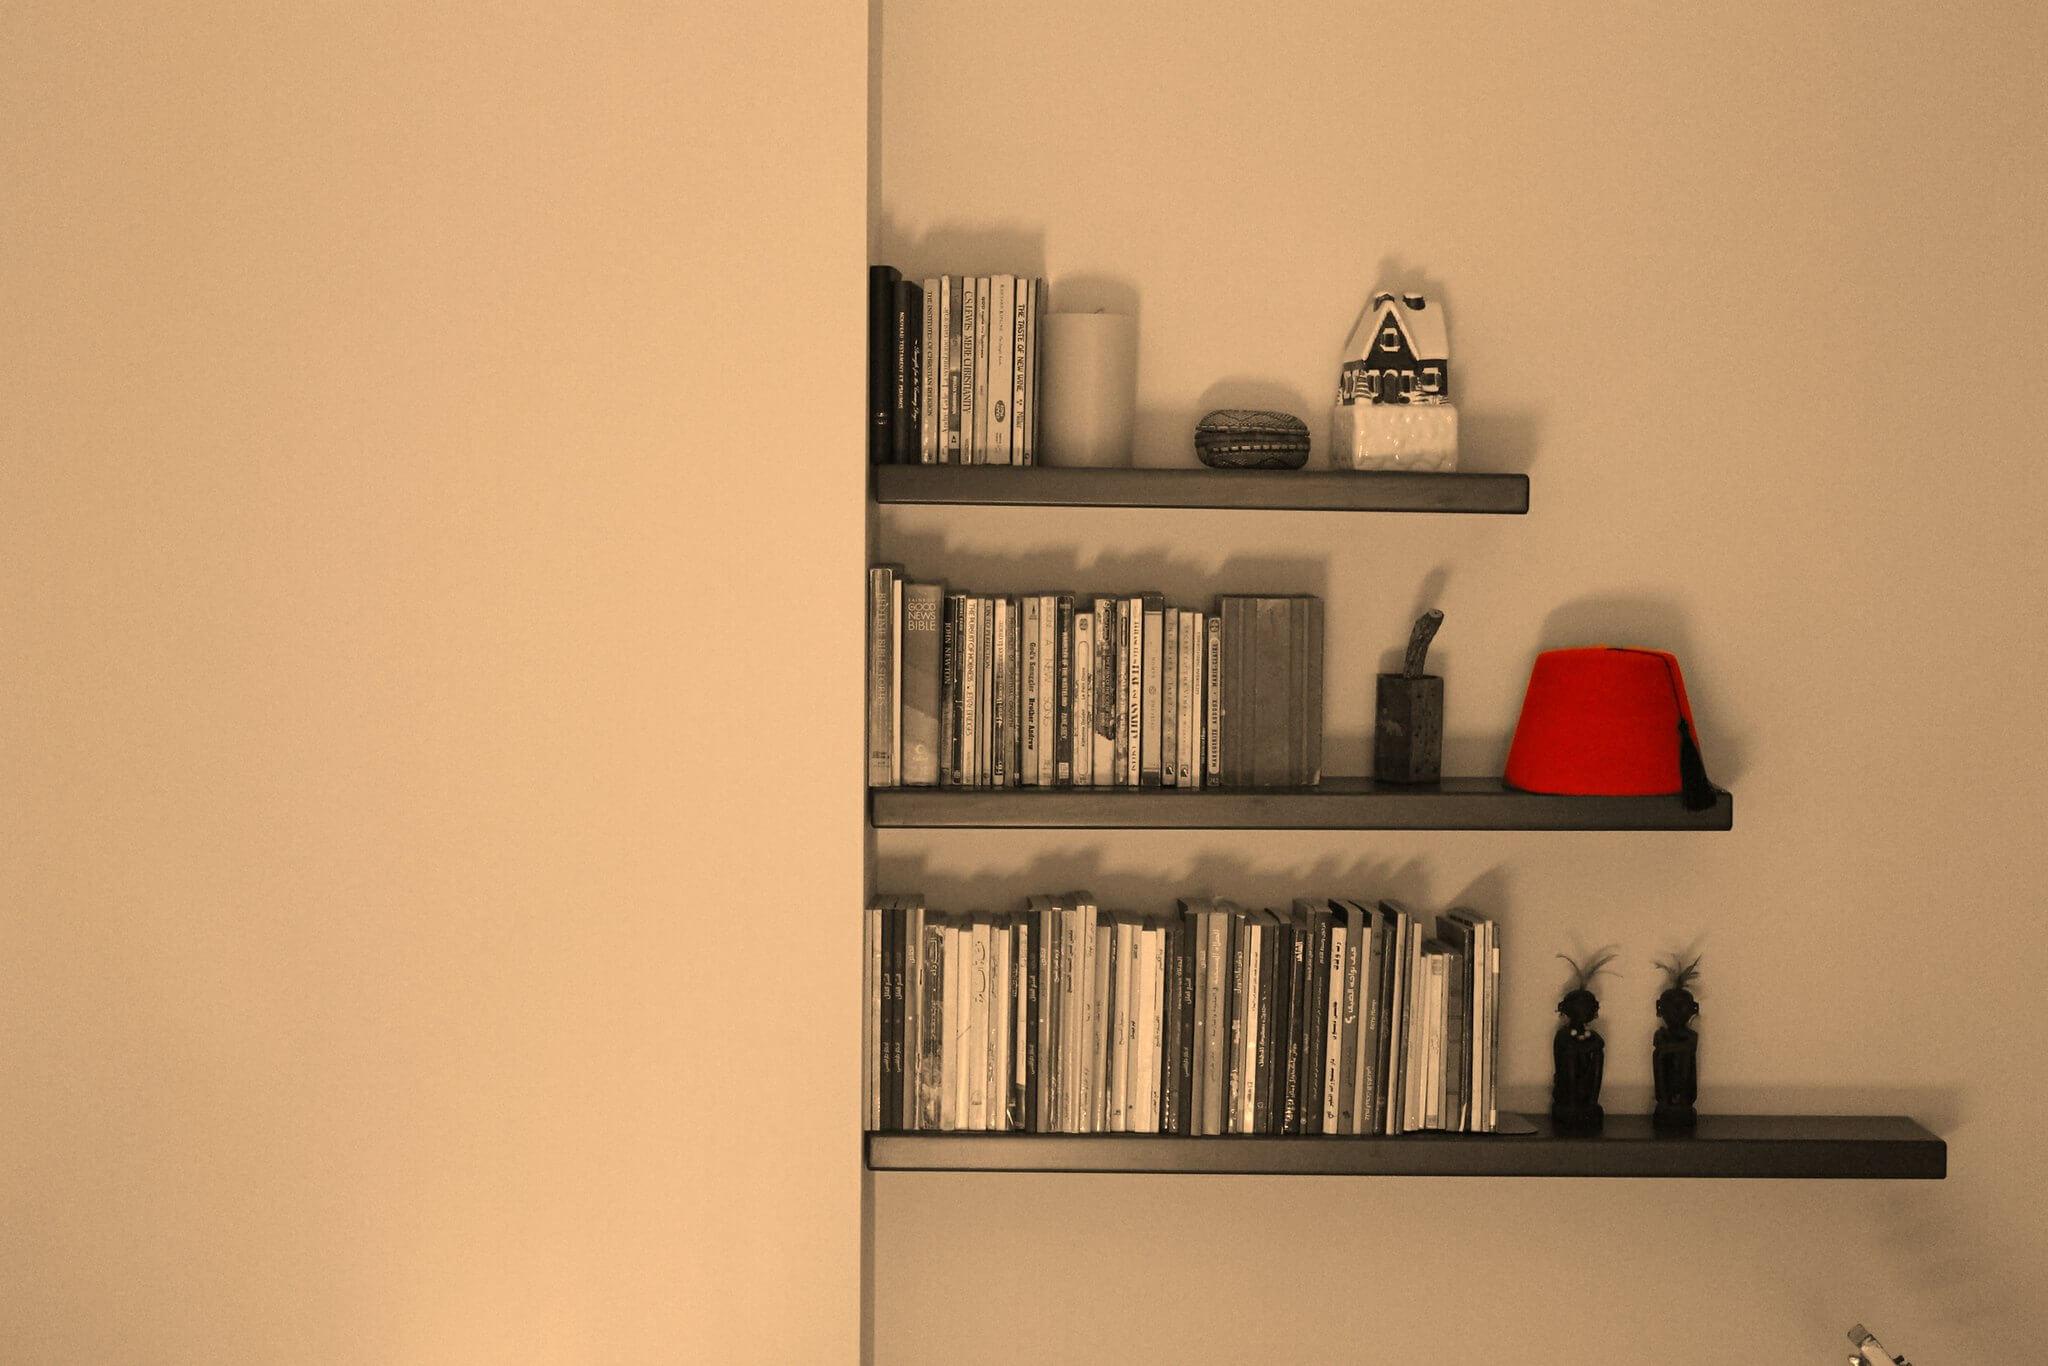 Bücherregal mit Wabi Sabi Dekoration